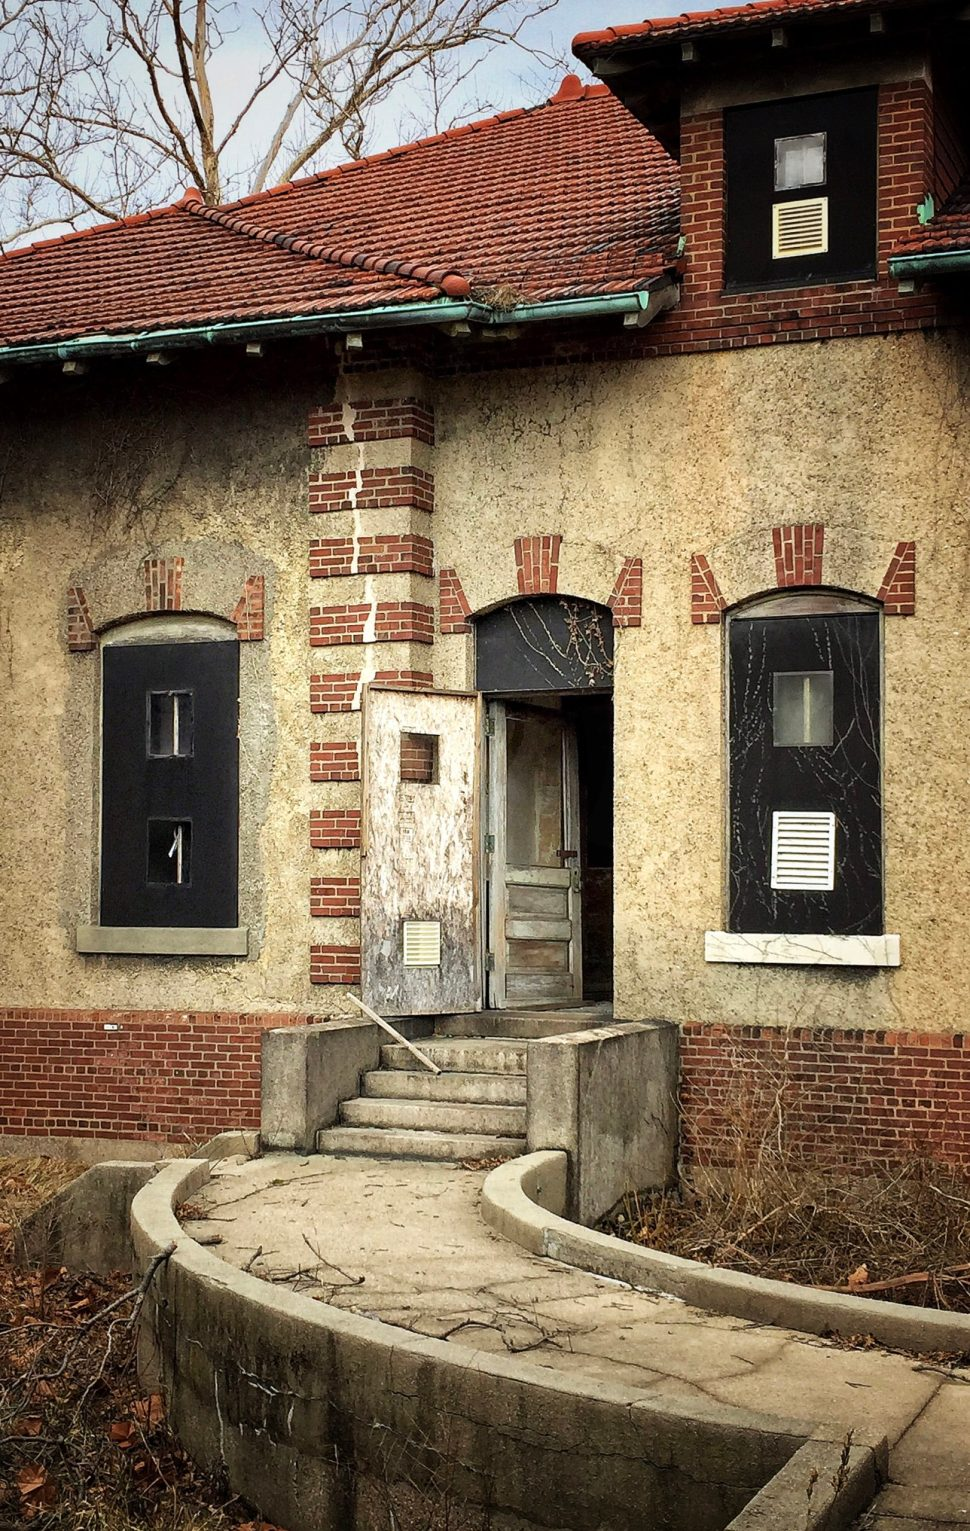 (1) Isolation Ward, Ellis Island. Photo by Rick Stachura. March 28, 2015.